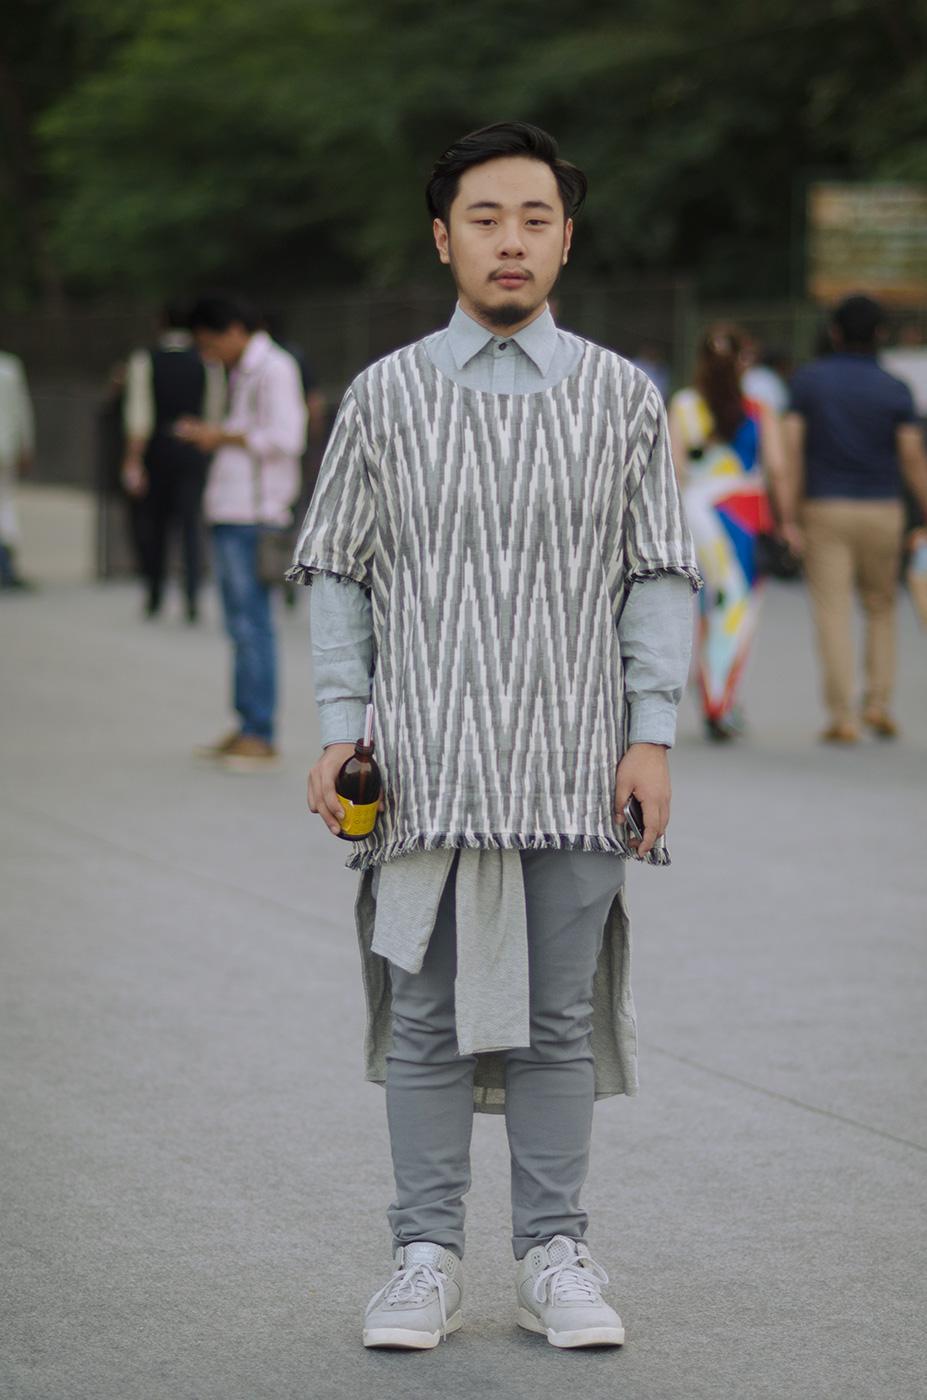 17e5da88647 10 outstanding examples of creative dressing